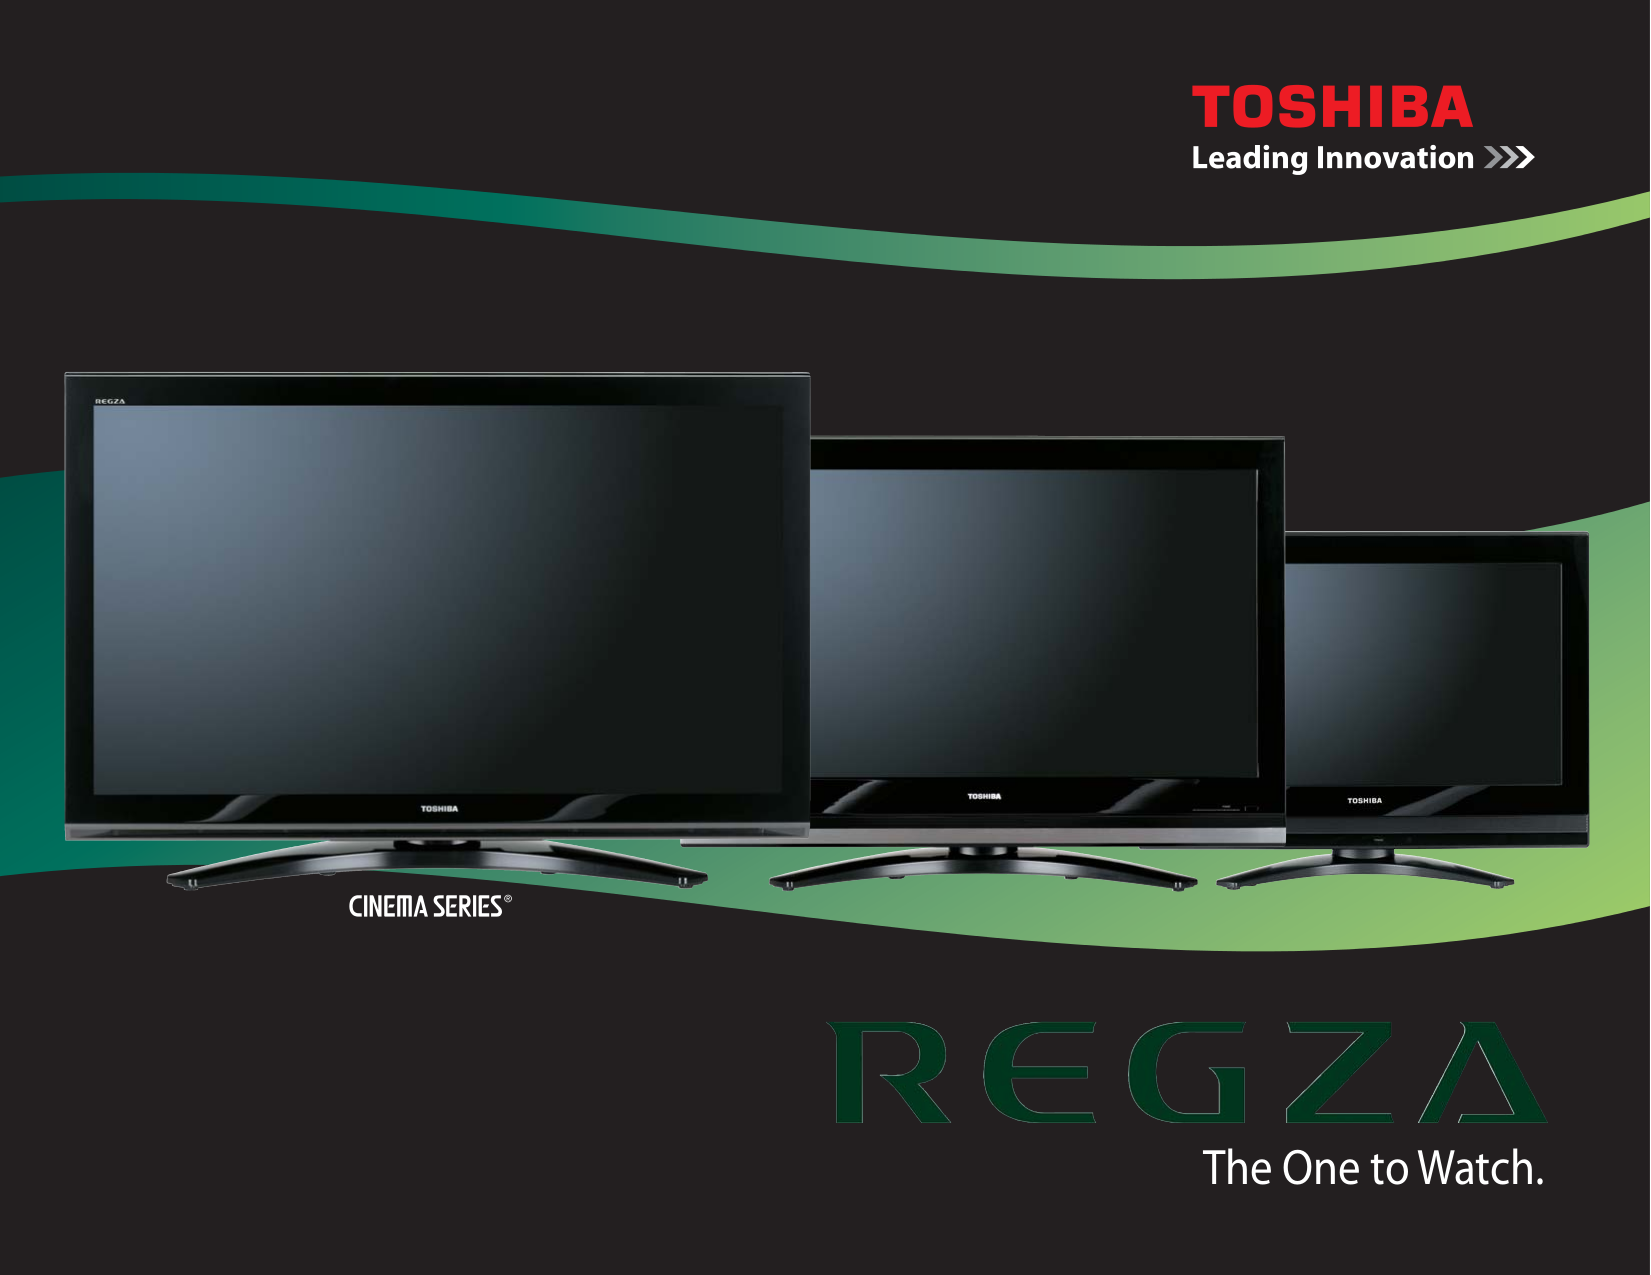 download free pdf for toshiba regza 42lx177 tv manual rh umlib com Toshiba Cinema Series Manual Toshiba Regza 32 Manual